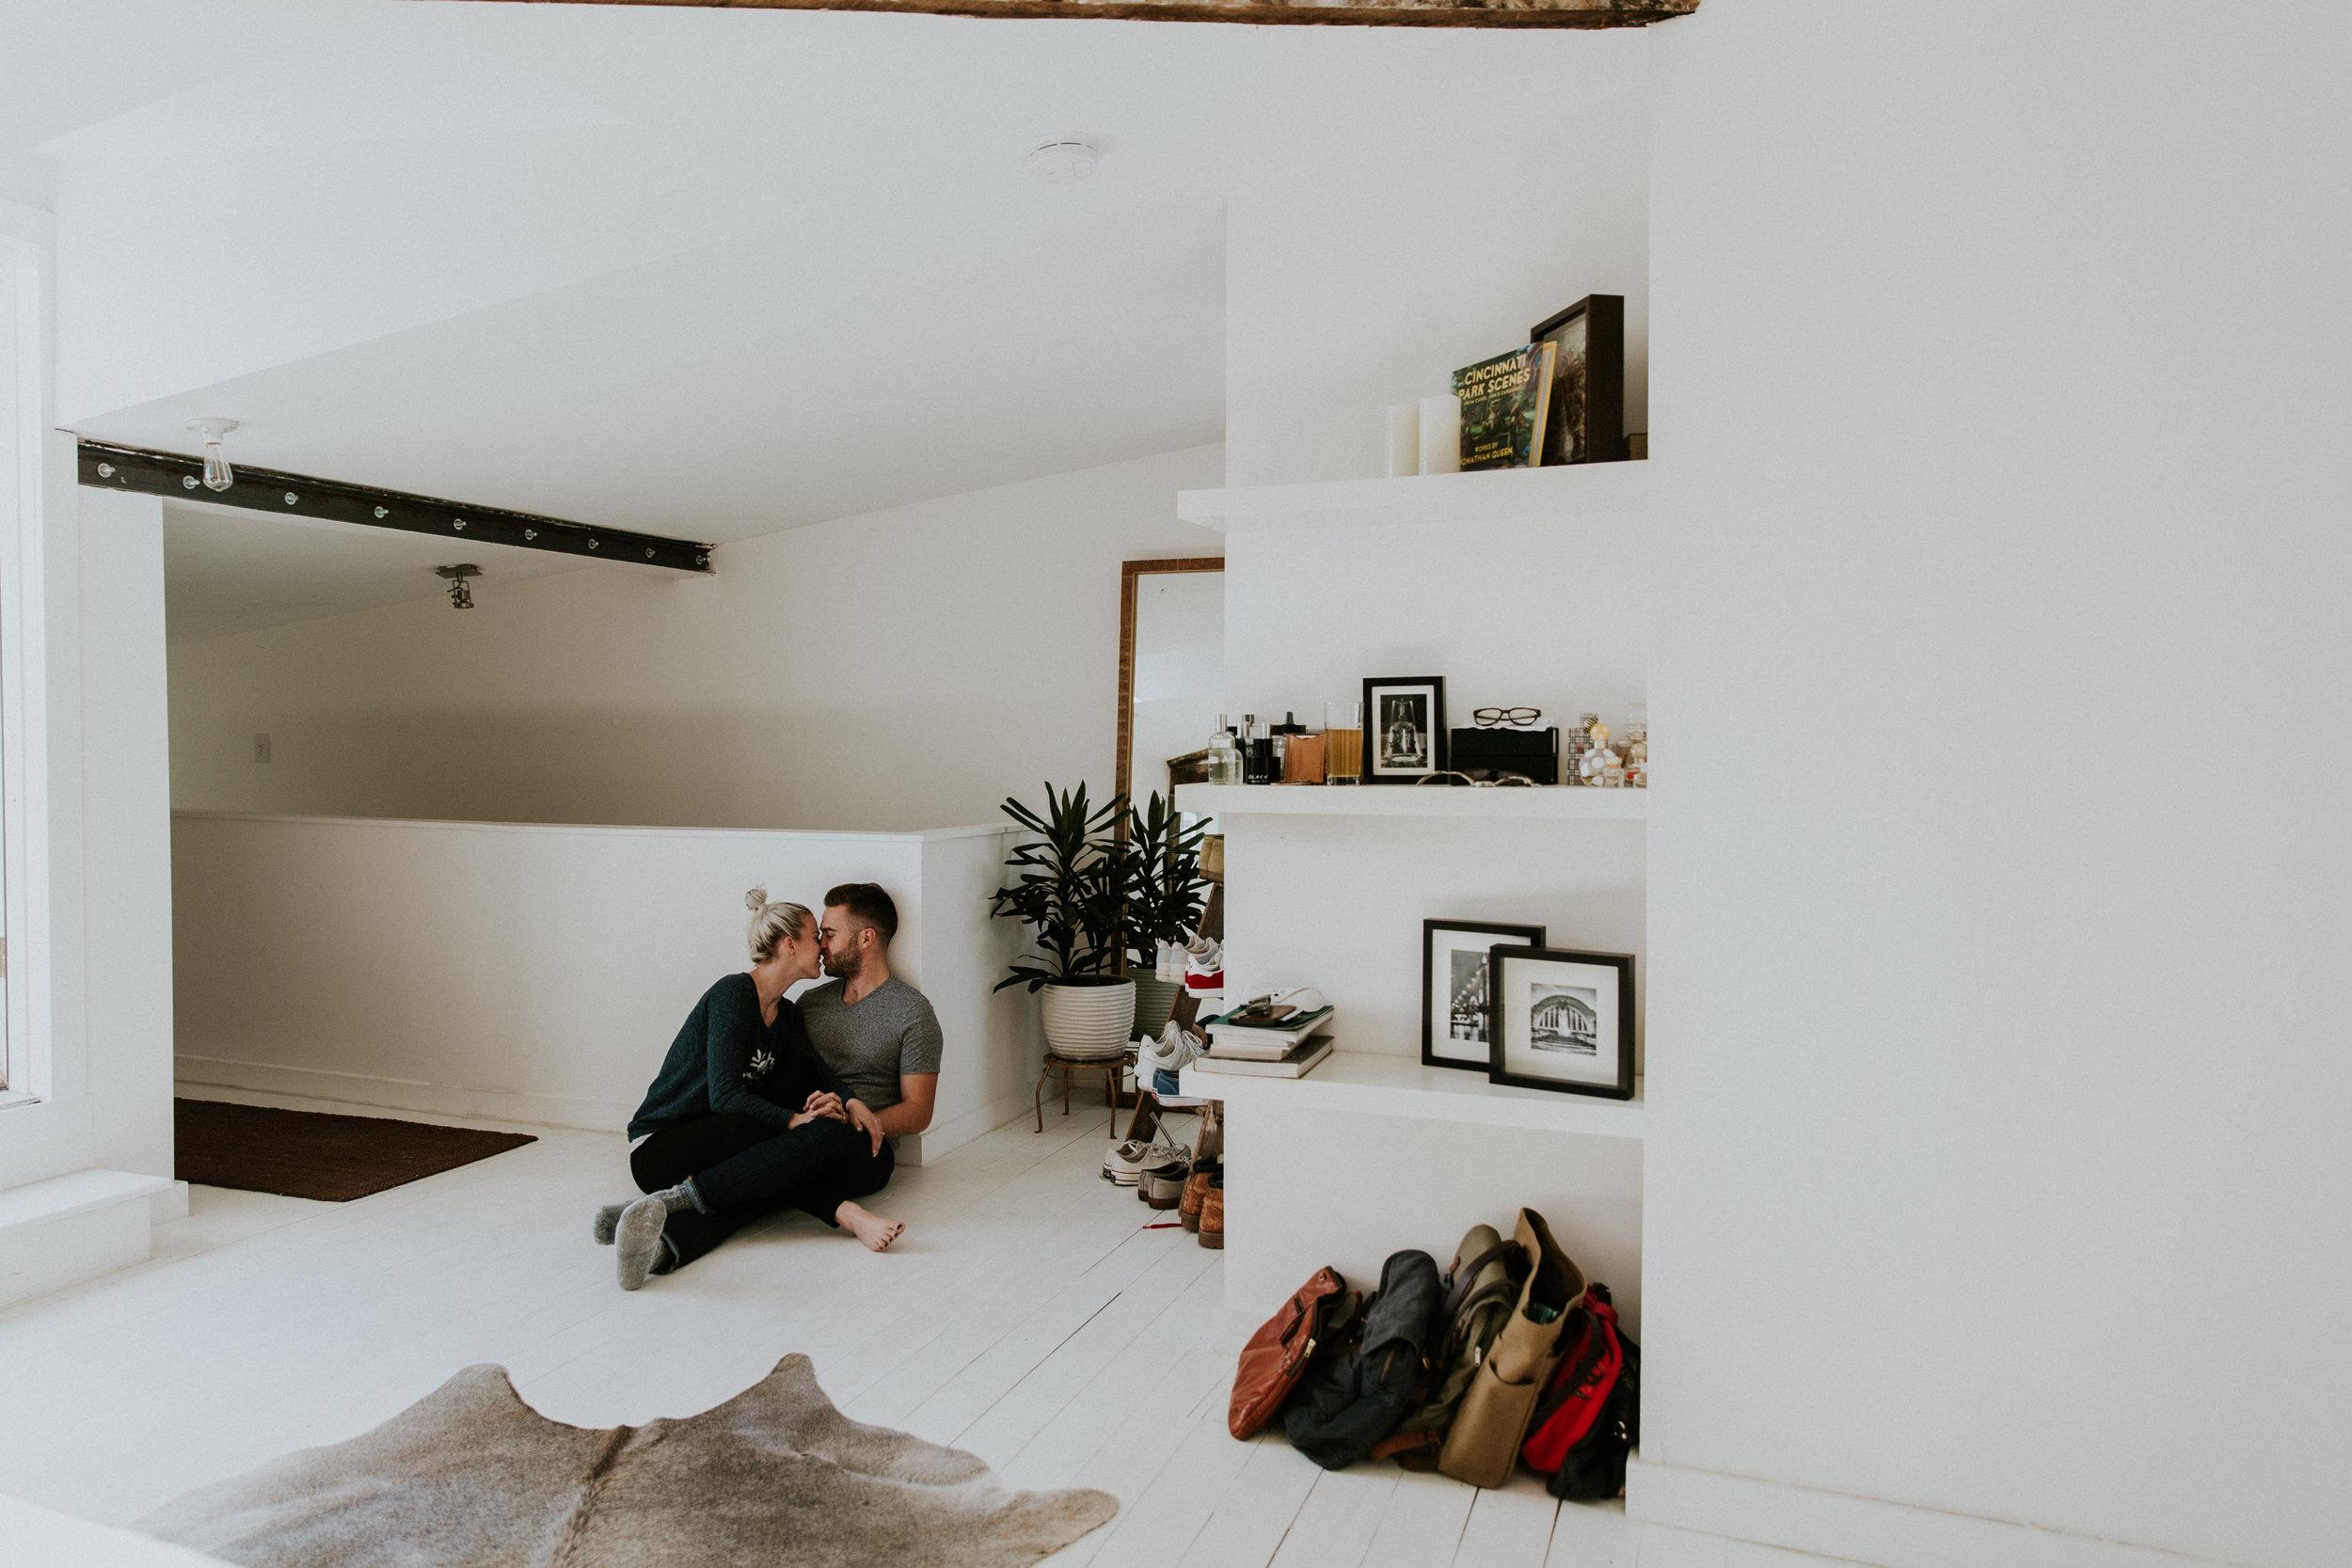 Jessie_and_Andrew-Cincinnati-Engagement-EDIT-83.jpg